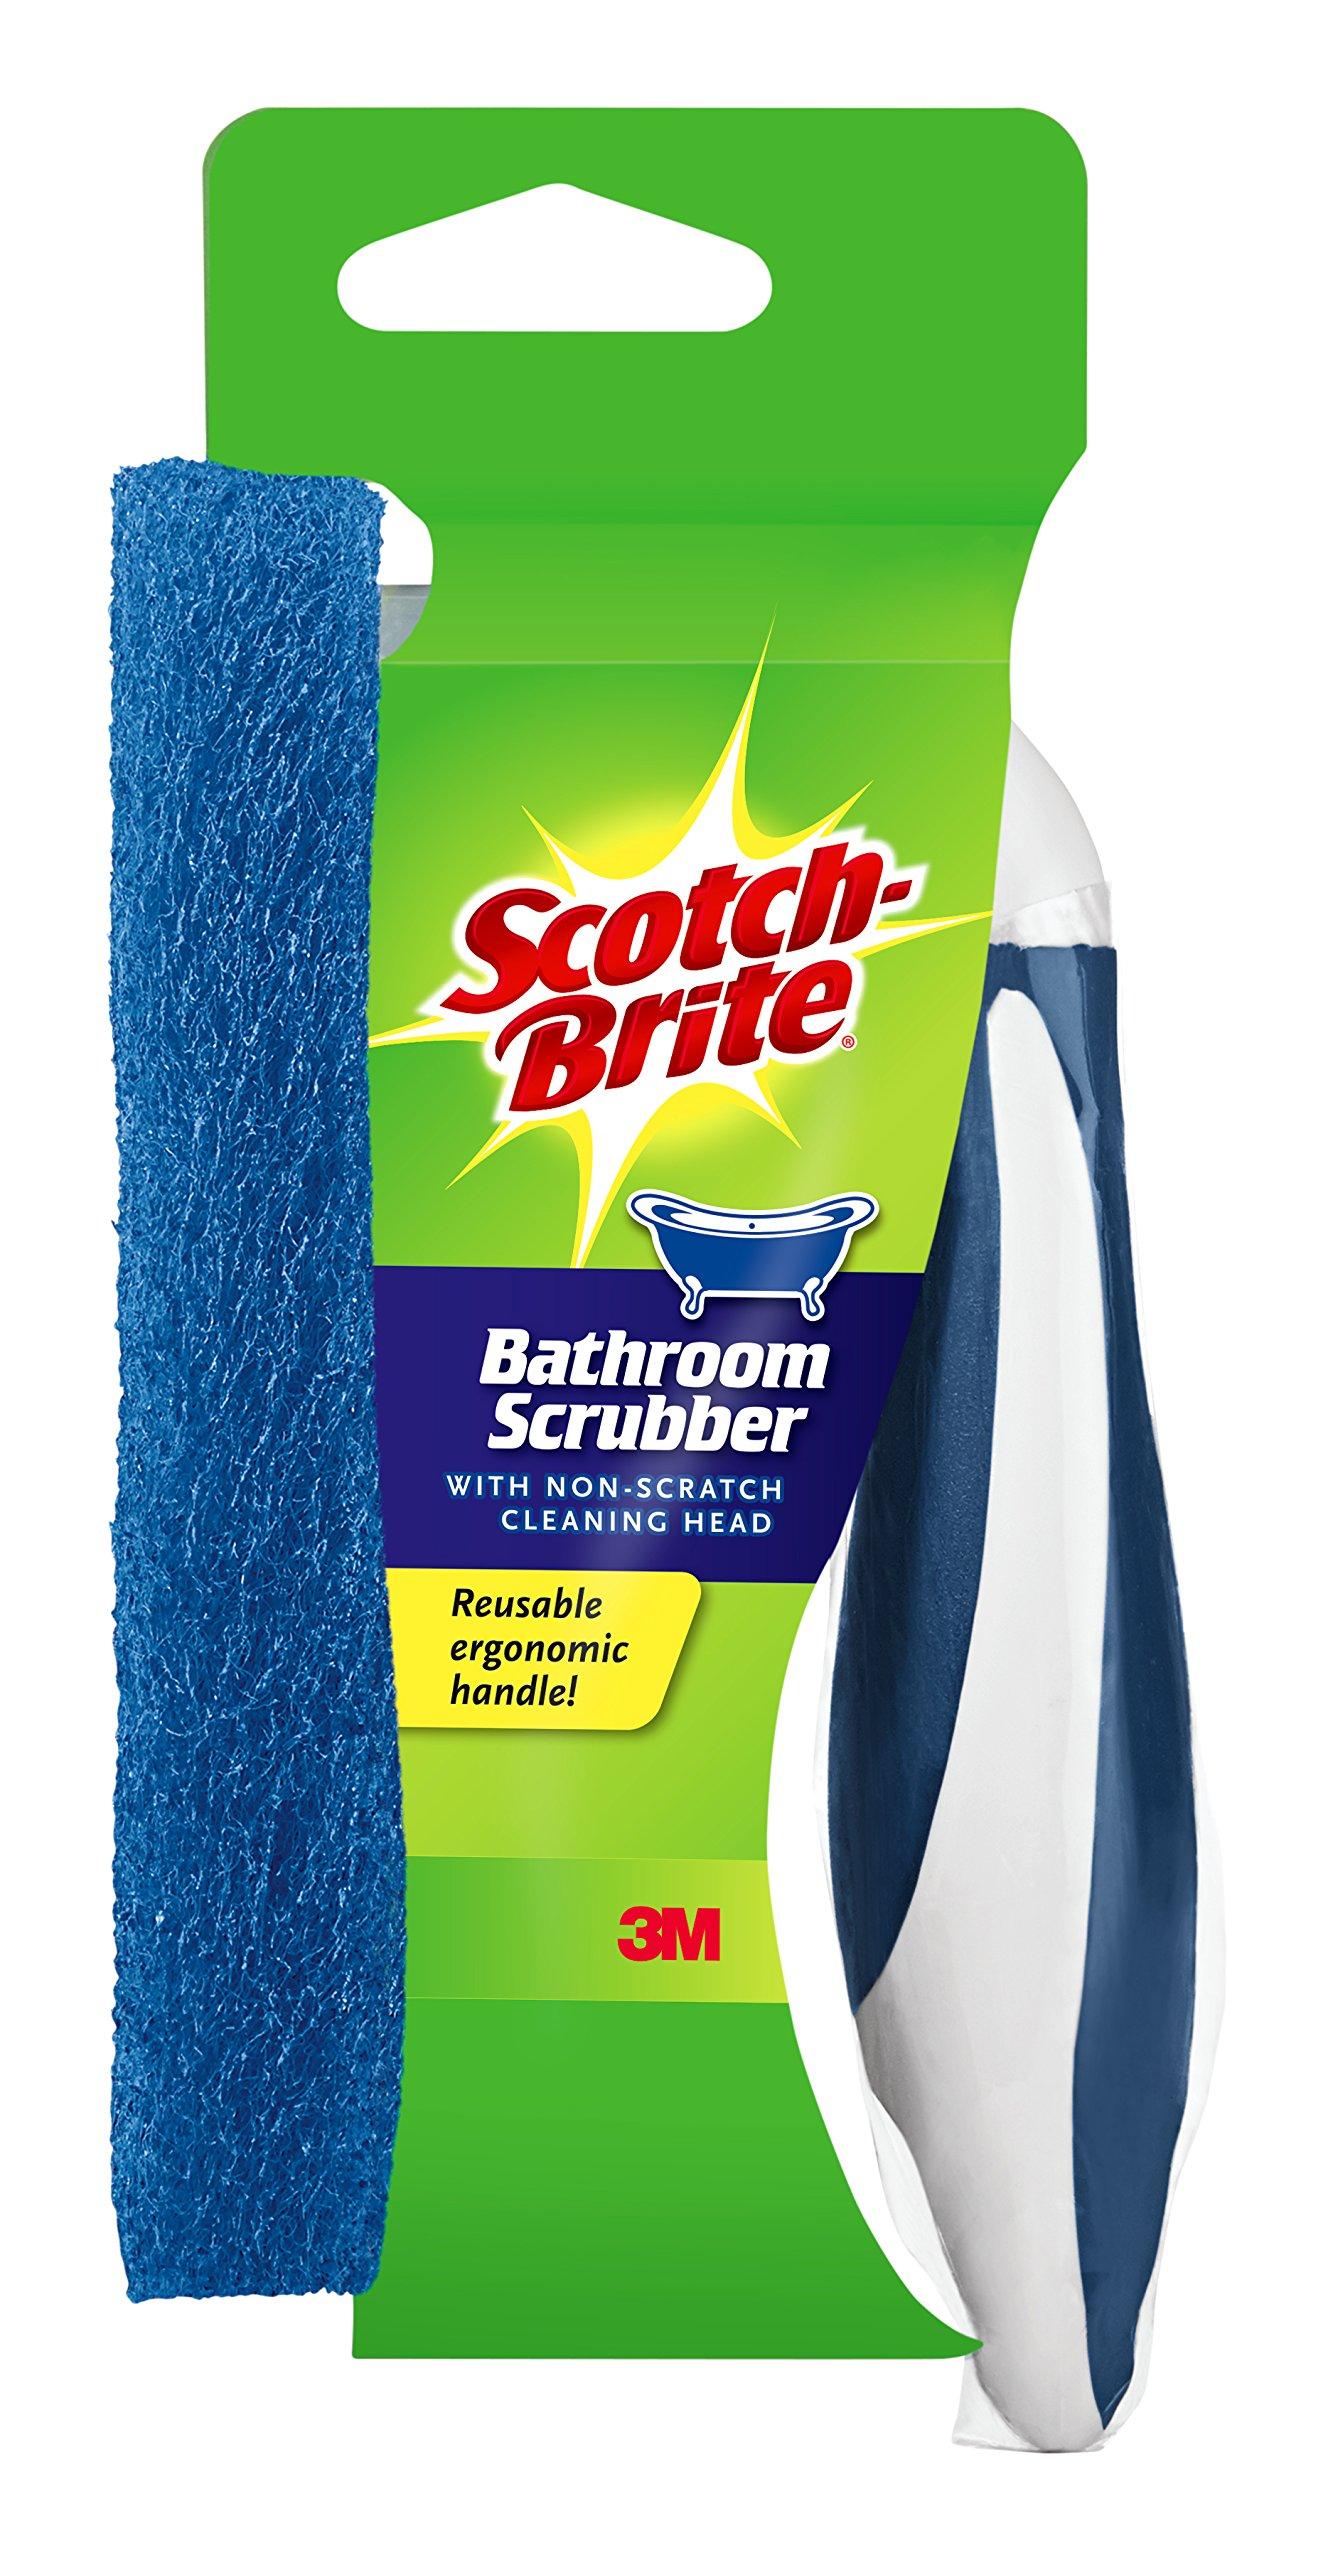 Scotch-Brite Non-Scratch Bathroom Scrubber with Reusable Handle